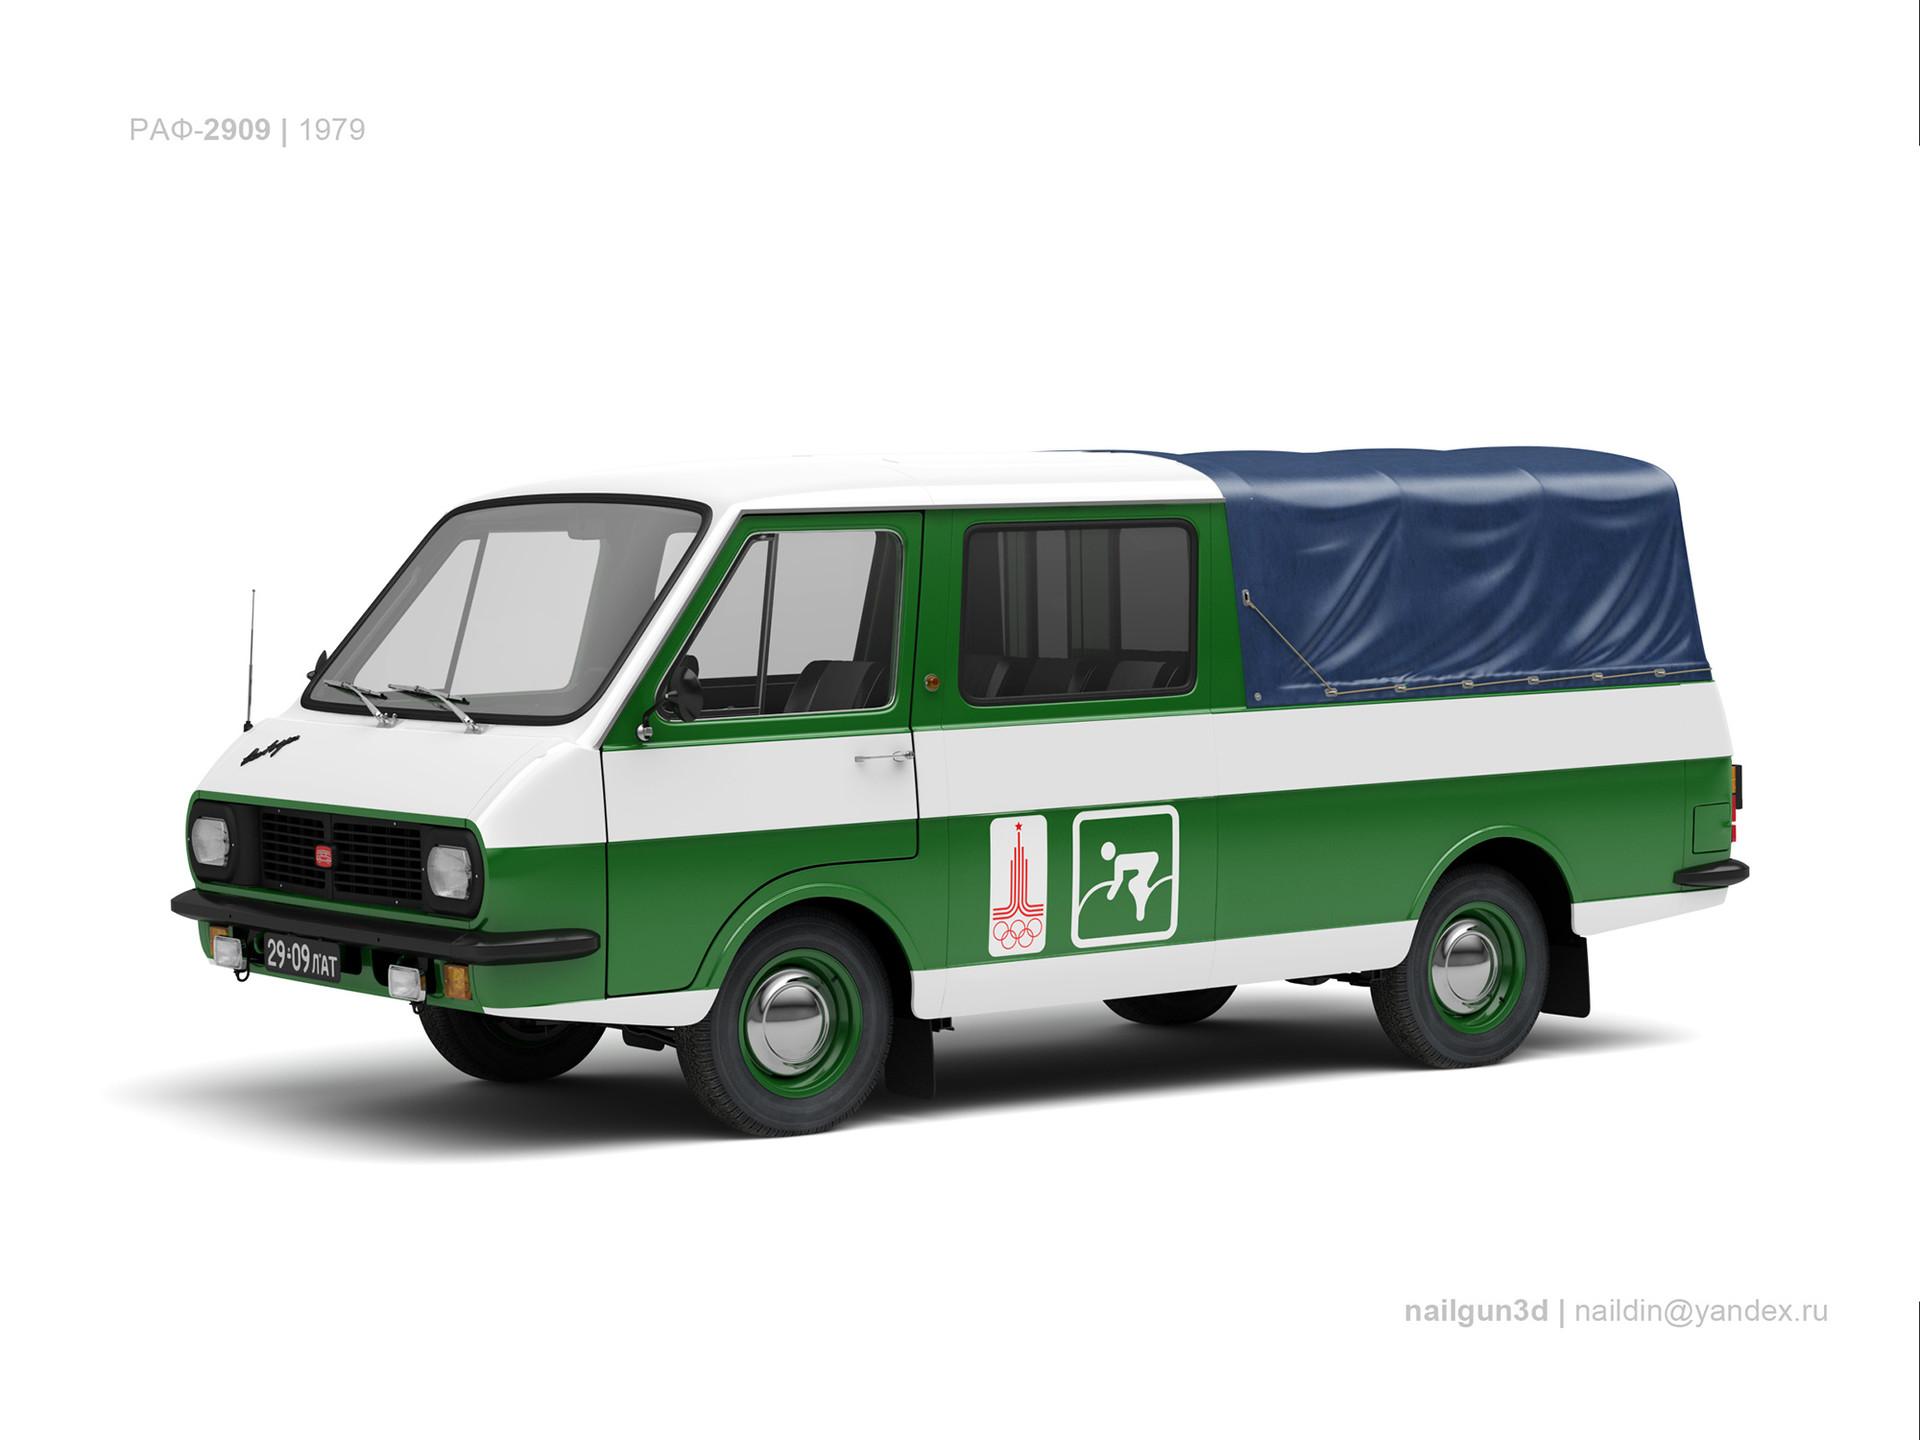 Nail khusnutdinov ussr raf 2909 1979 0